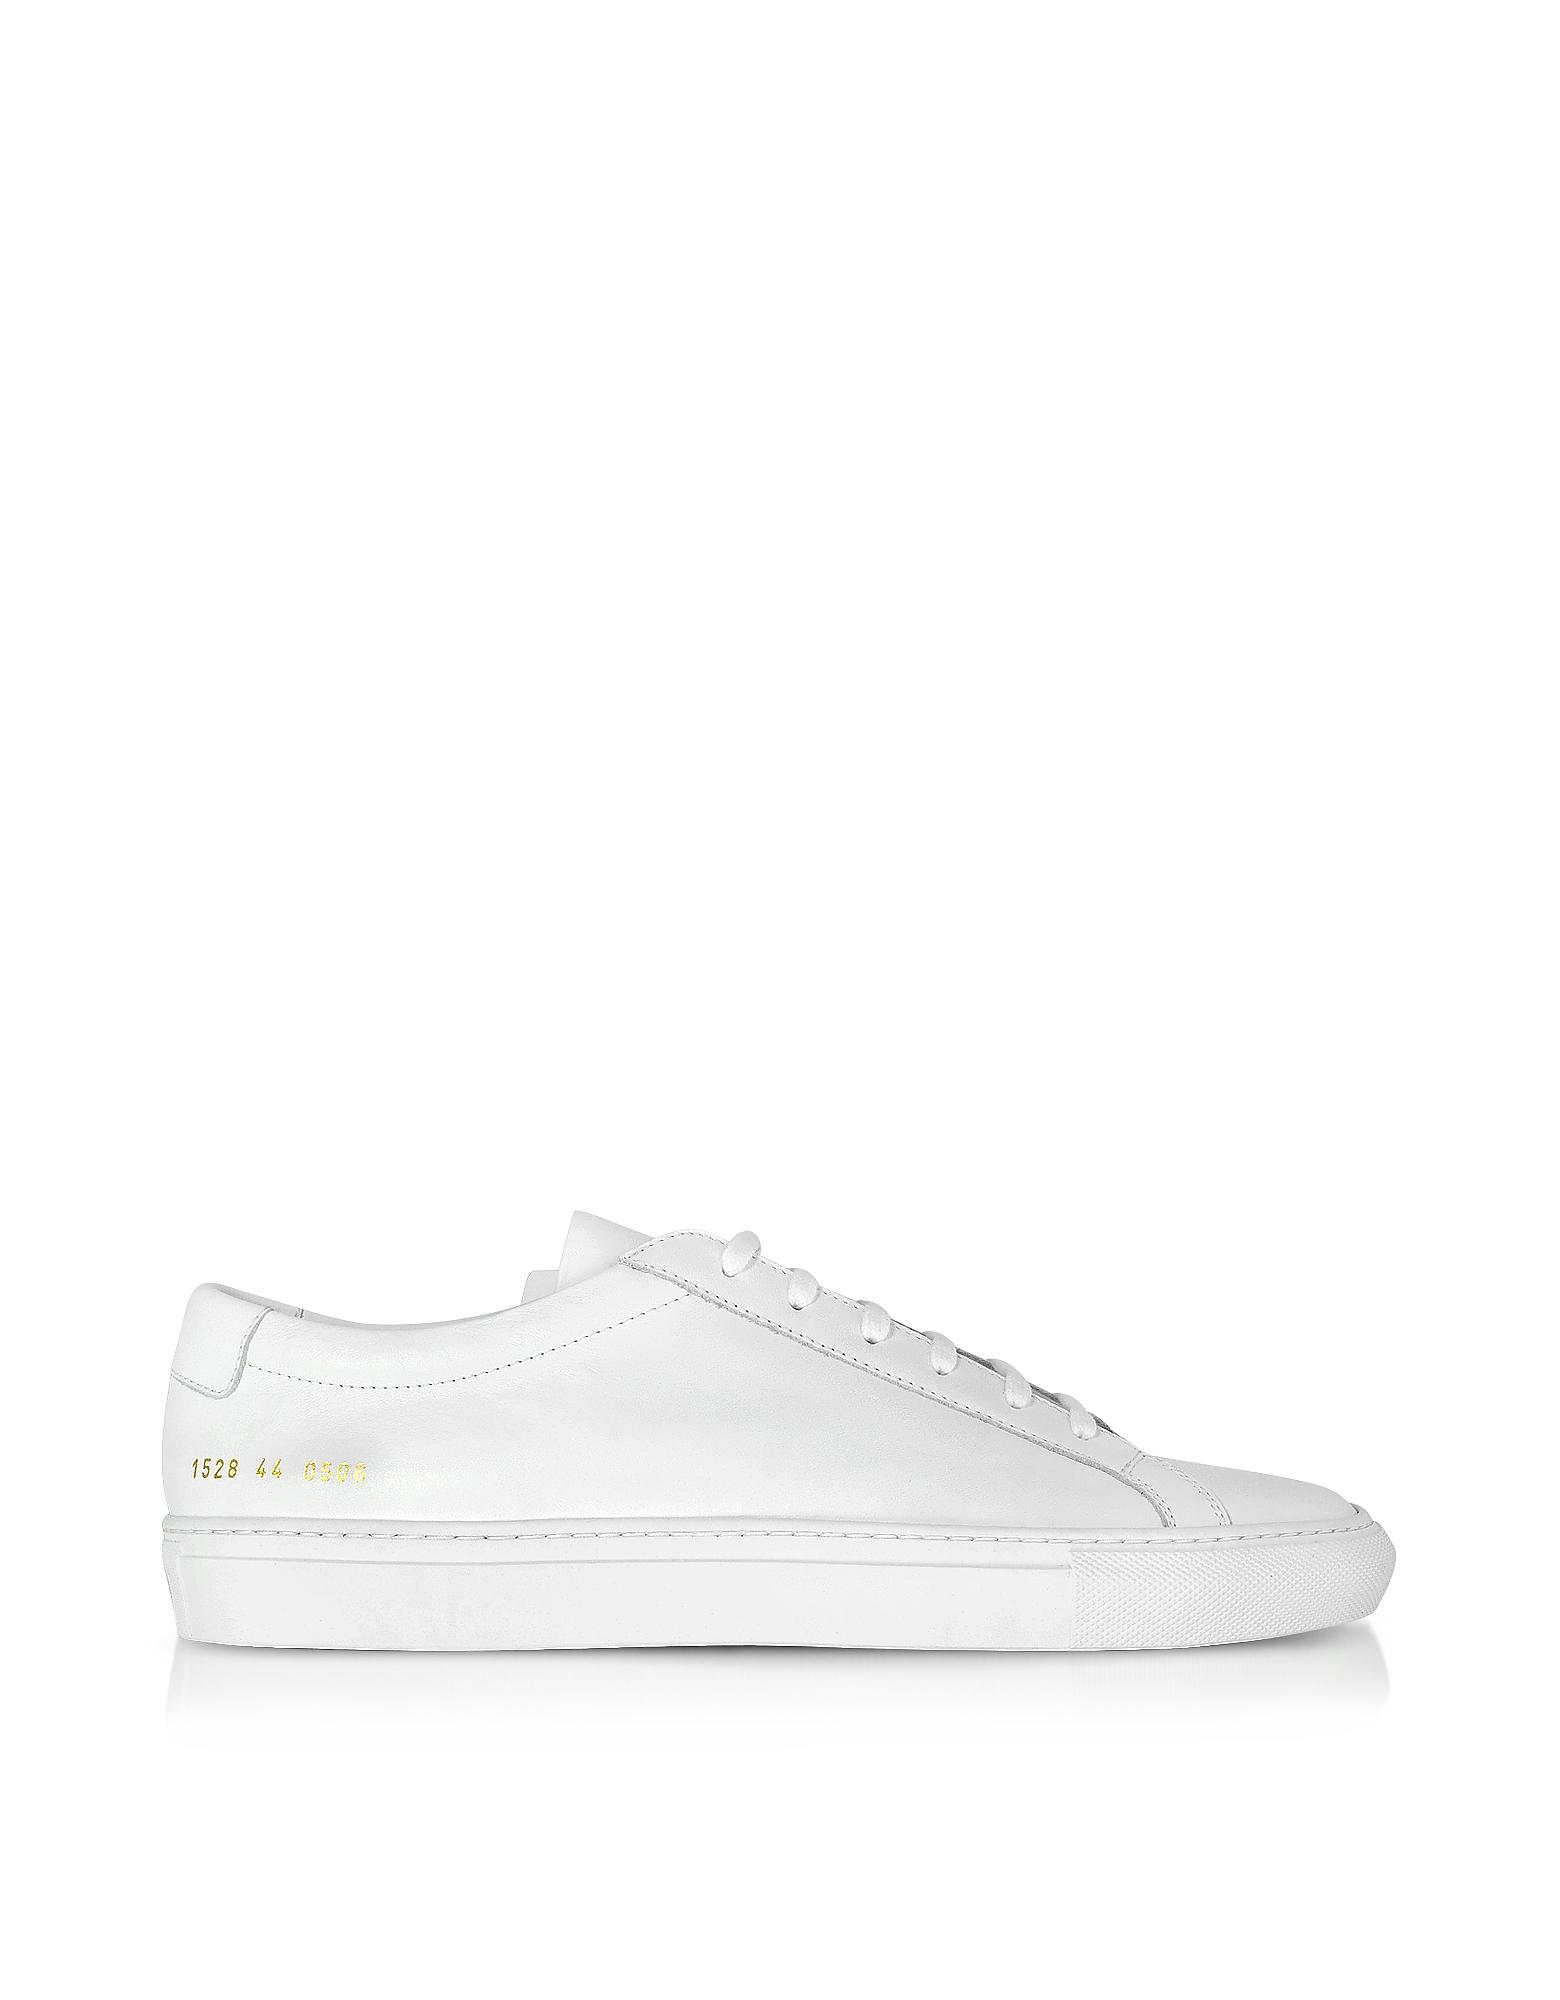 Original Achilles Low Sneakers da Uomo in Pelle Bianco Ottico